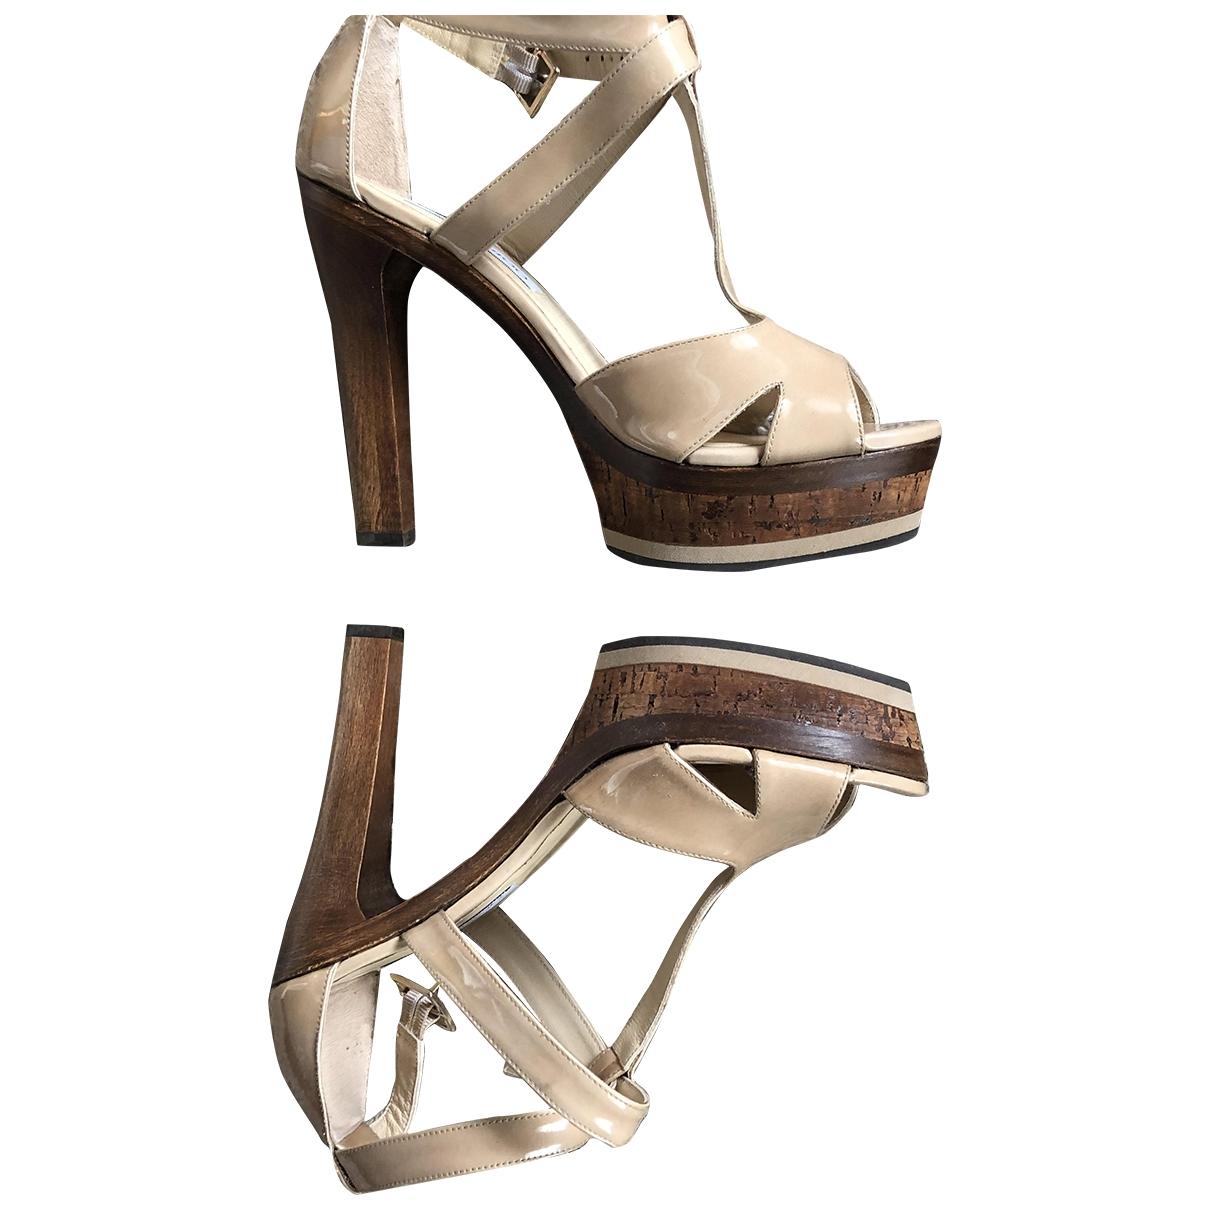 Jimmy Choo \N Beige Patent leather Sandals for Women 39 EU